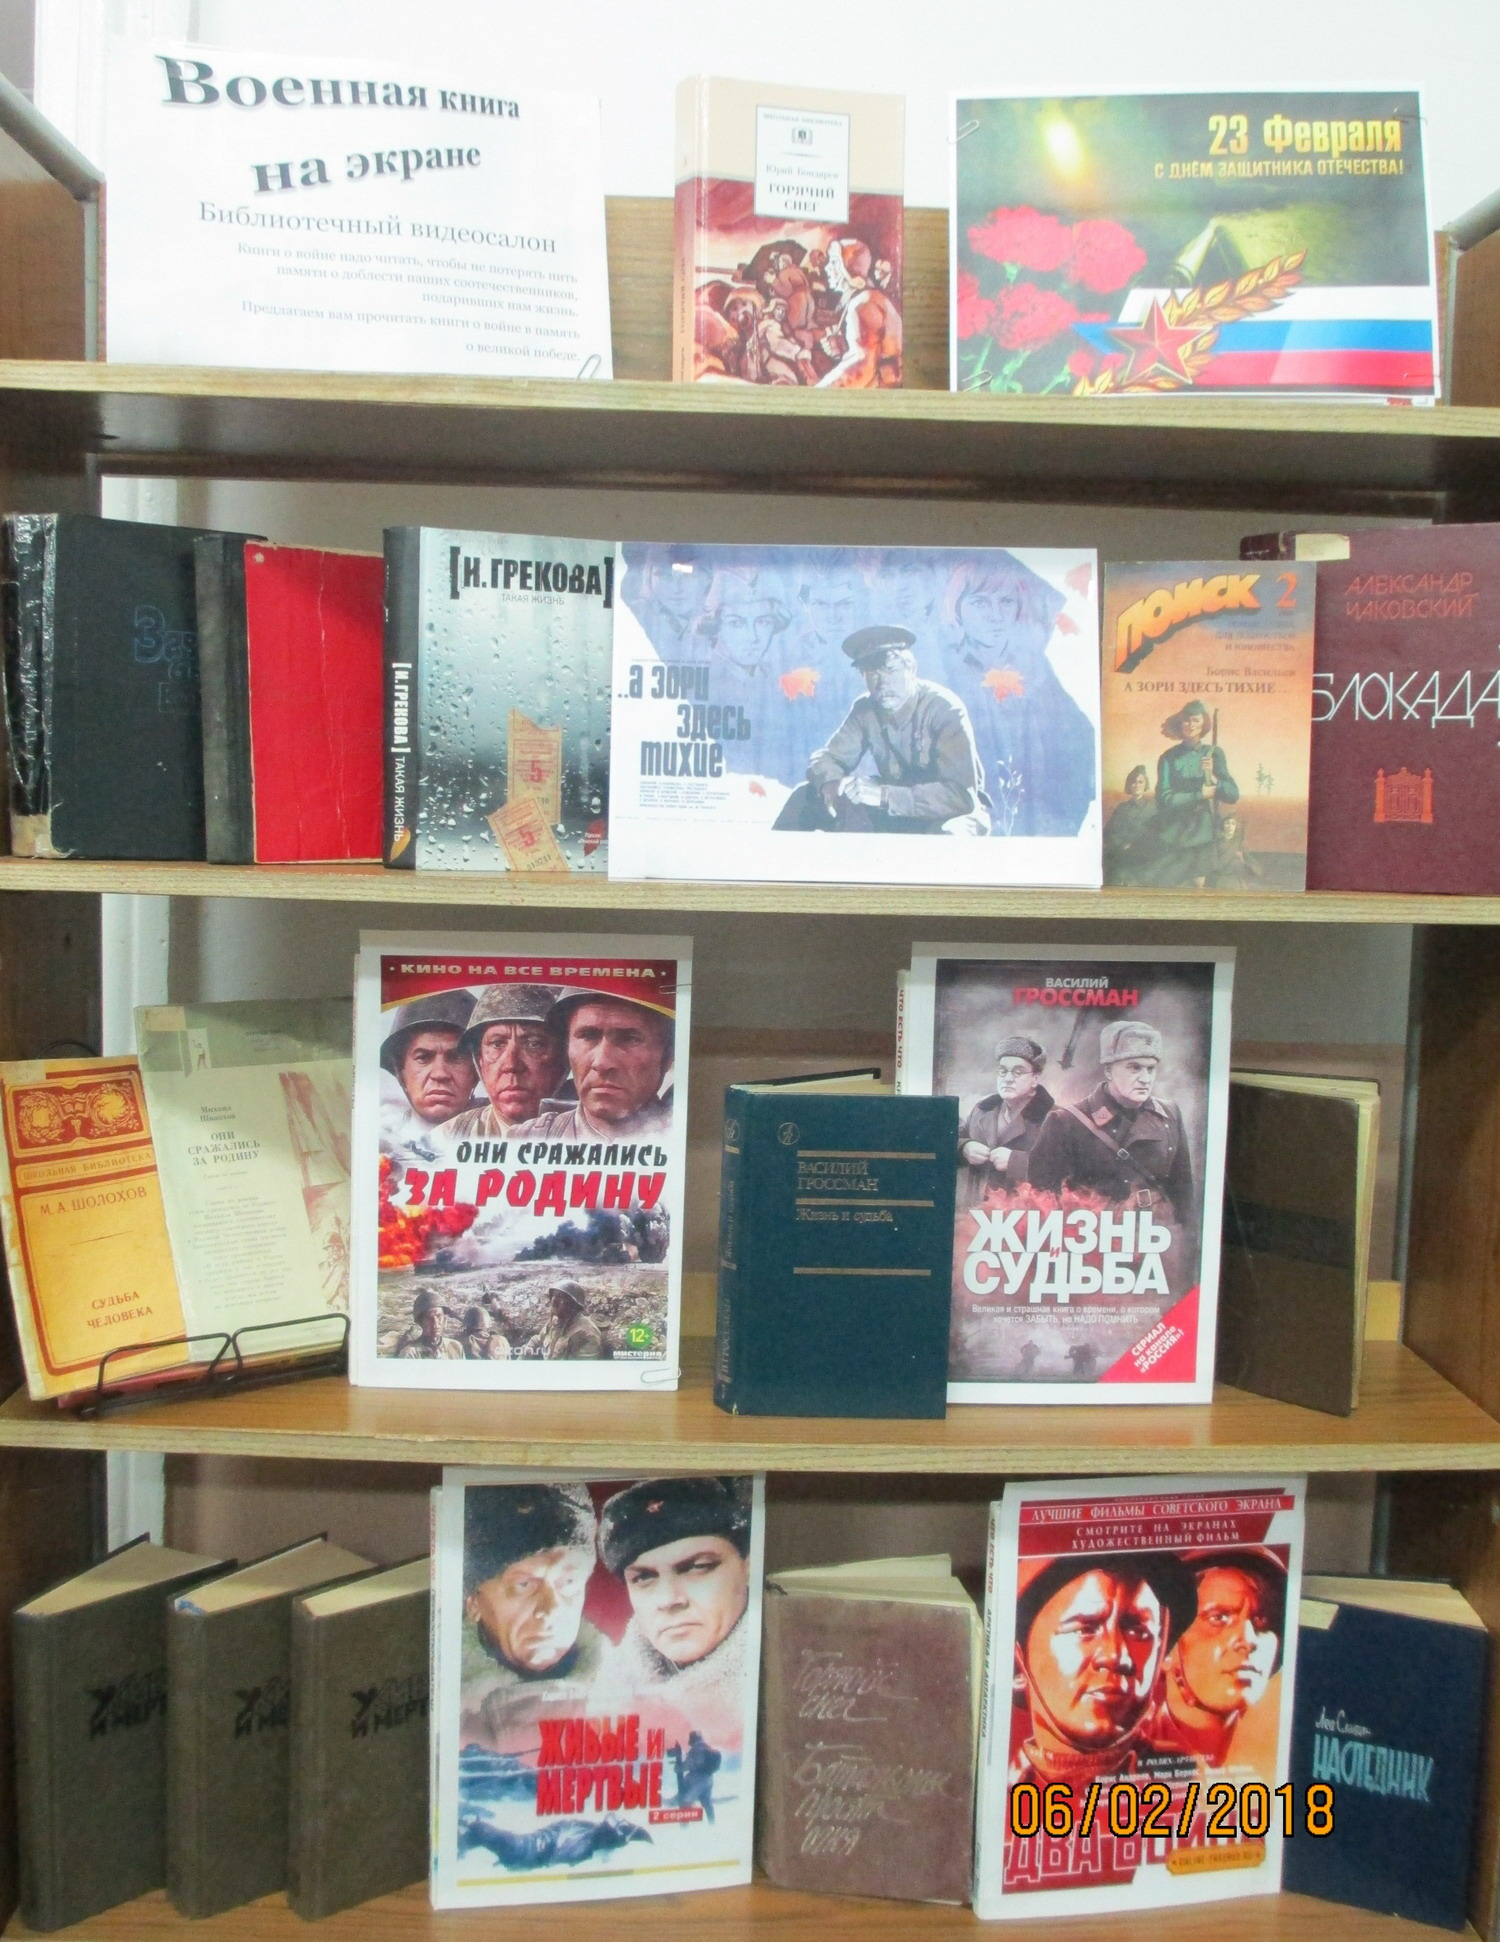 Военная книга на экране